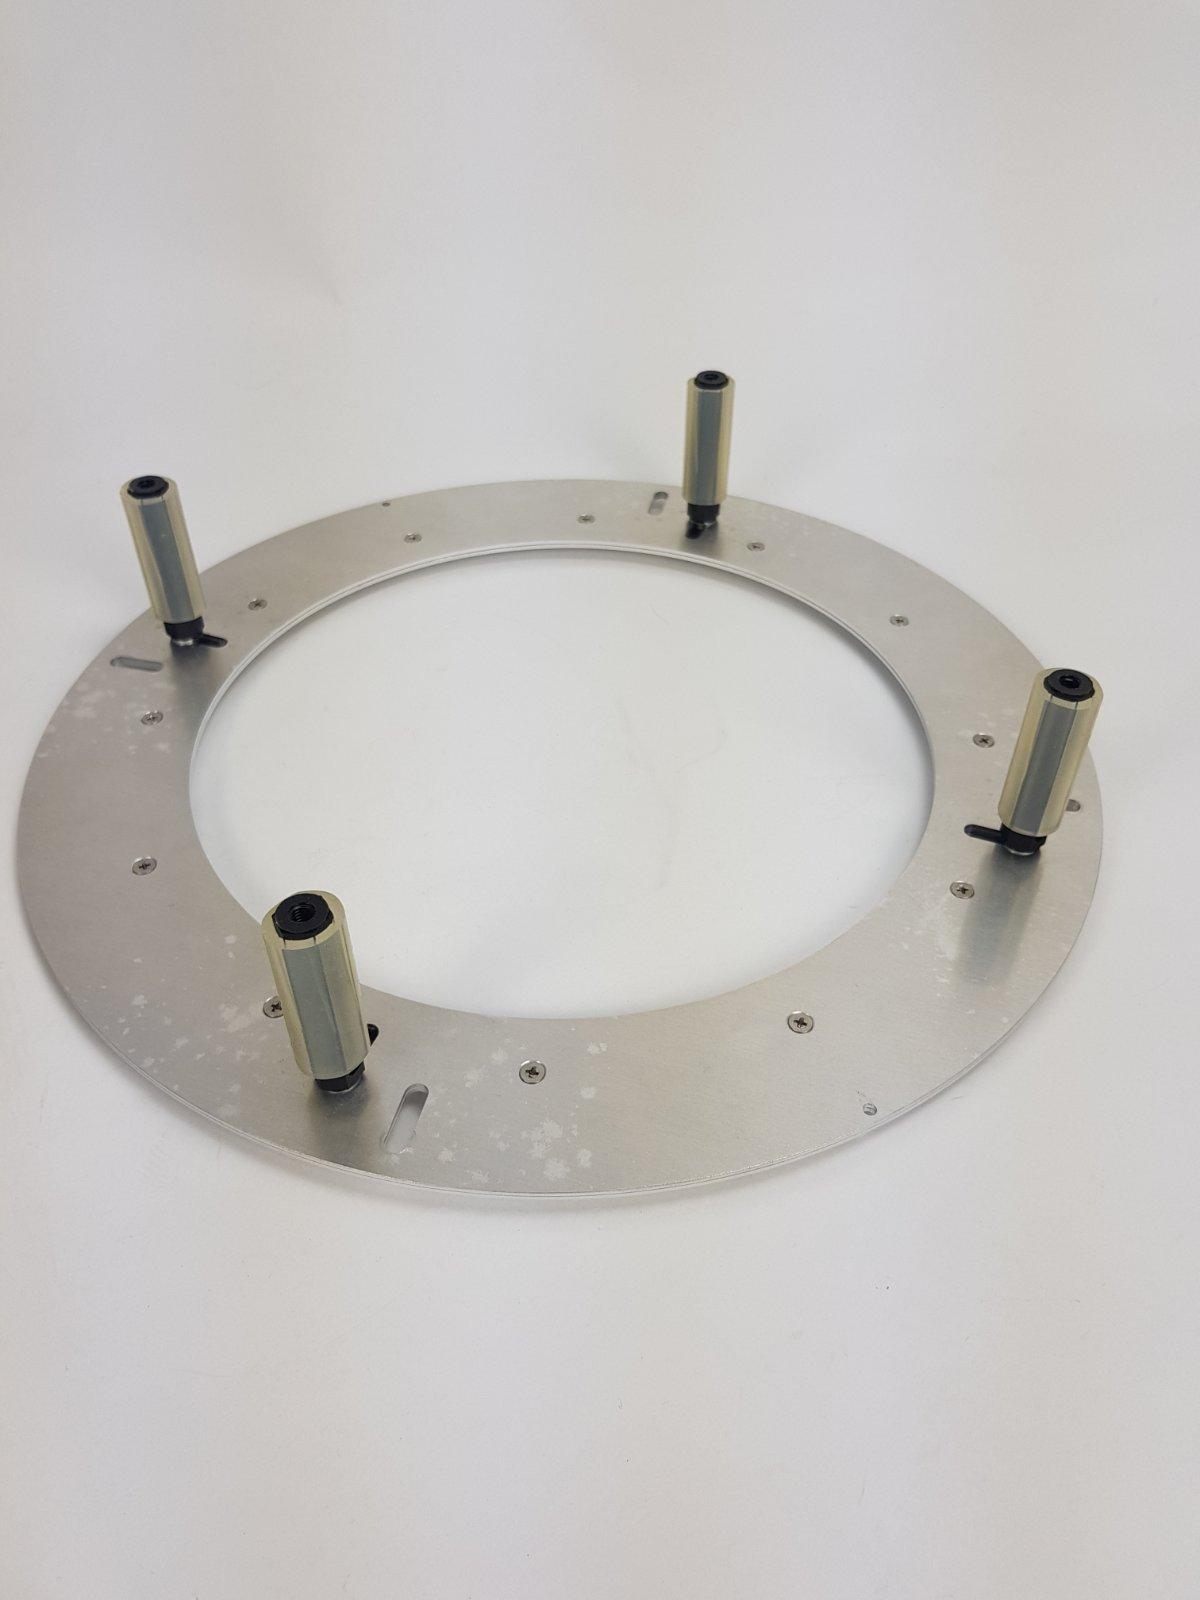 Euro EMC cella per diametro da 207 mm, per telescopi da 219mm a 283mm